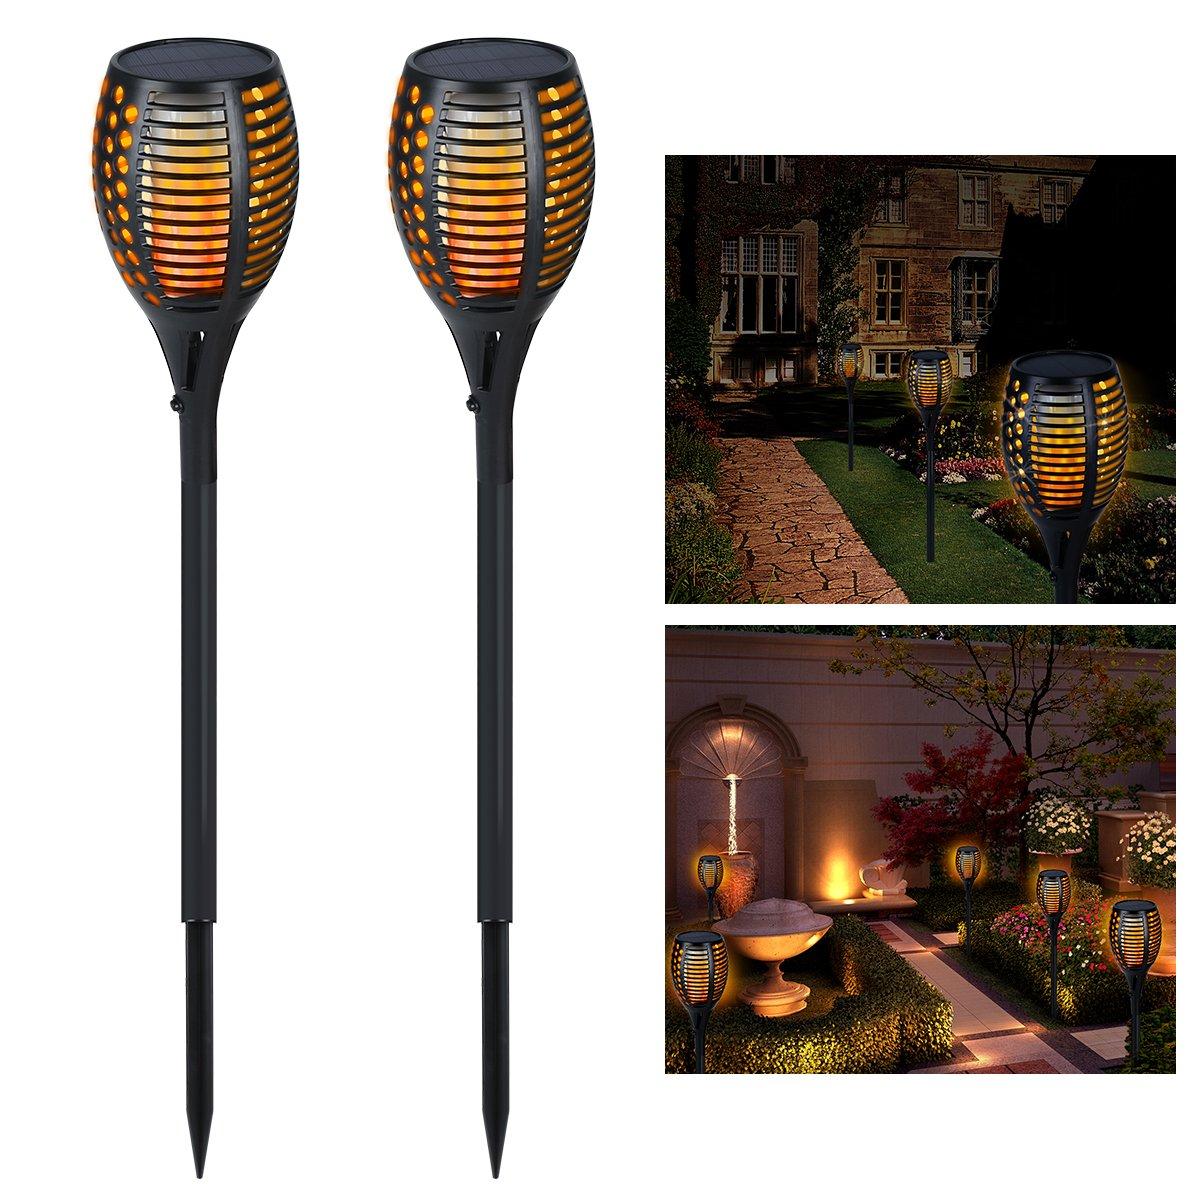 yunlights solarleuchten garten licht solar led fackel 96 flamme gartenfackel ebay. Black Bedroom Furniture Sets. Home Design Ideas